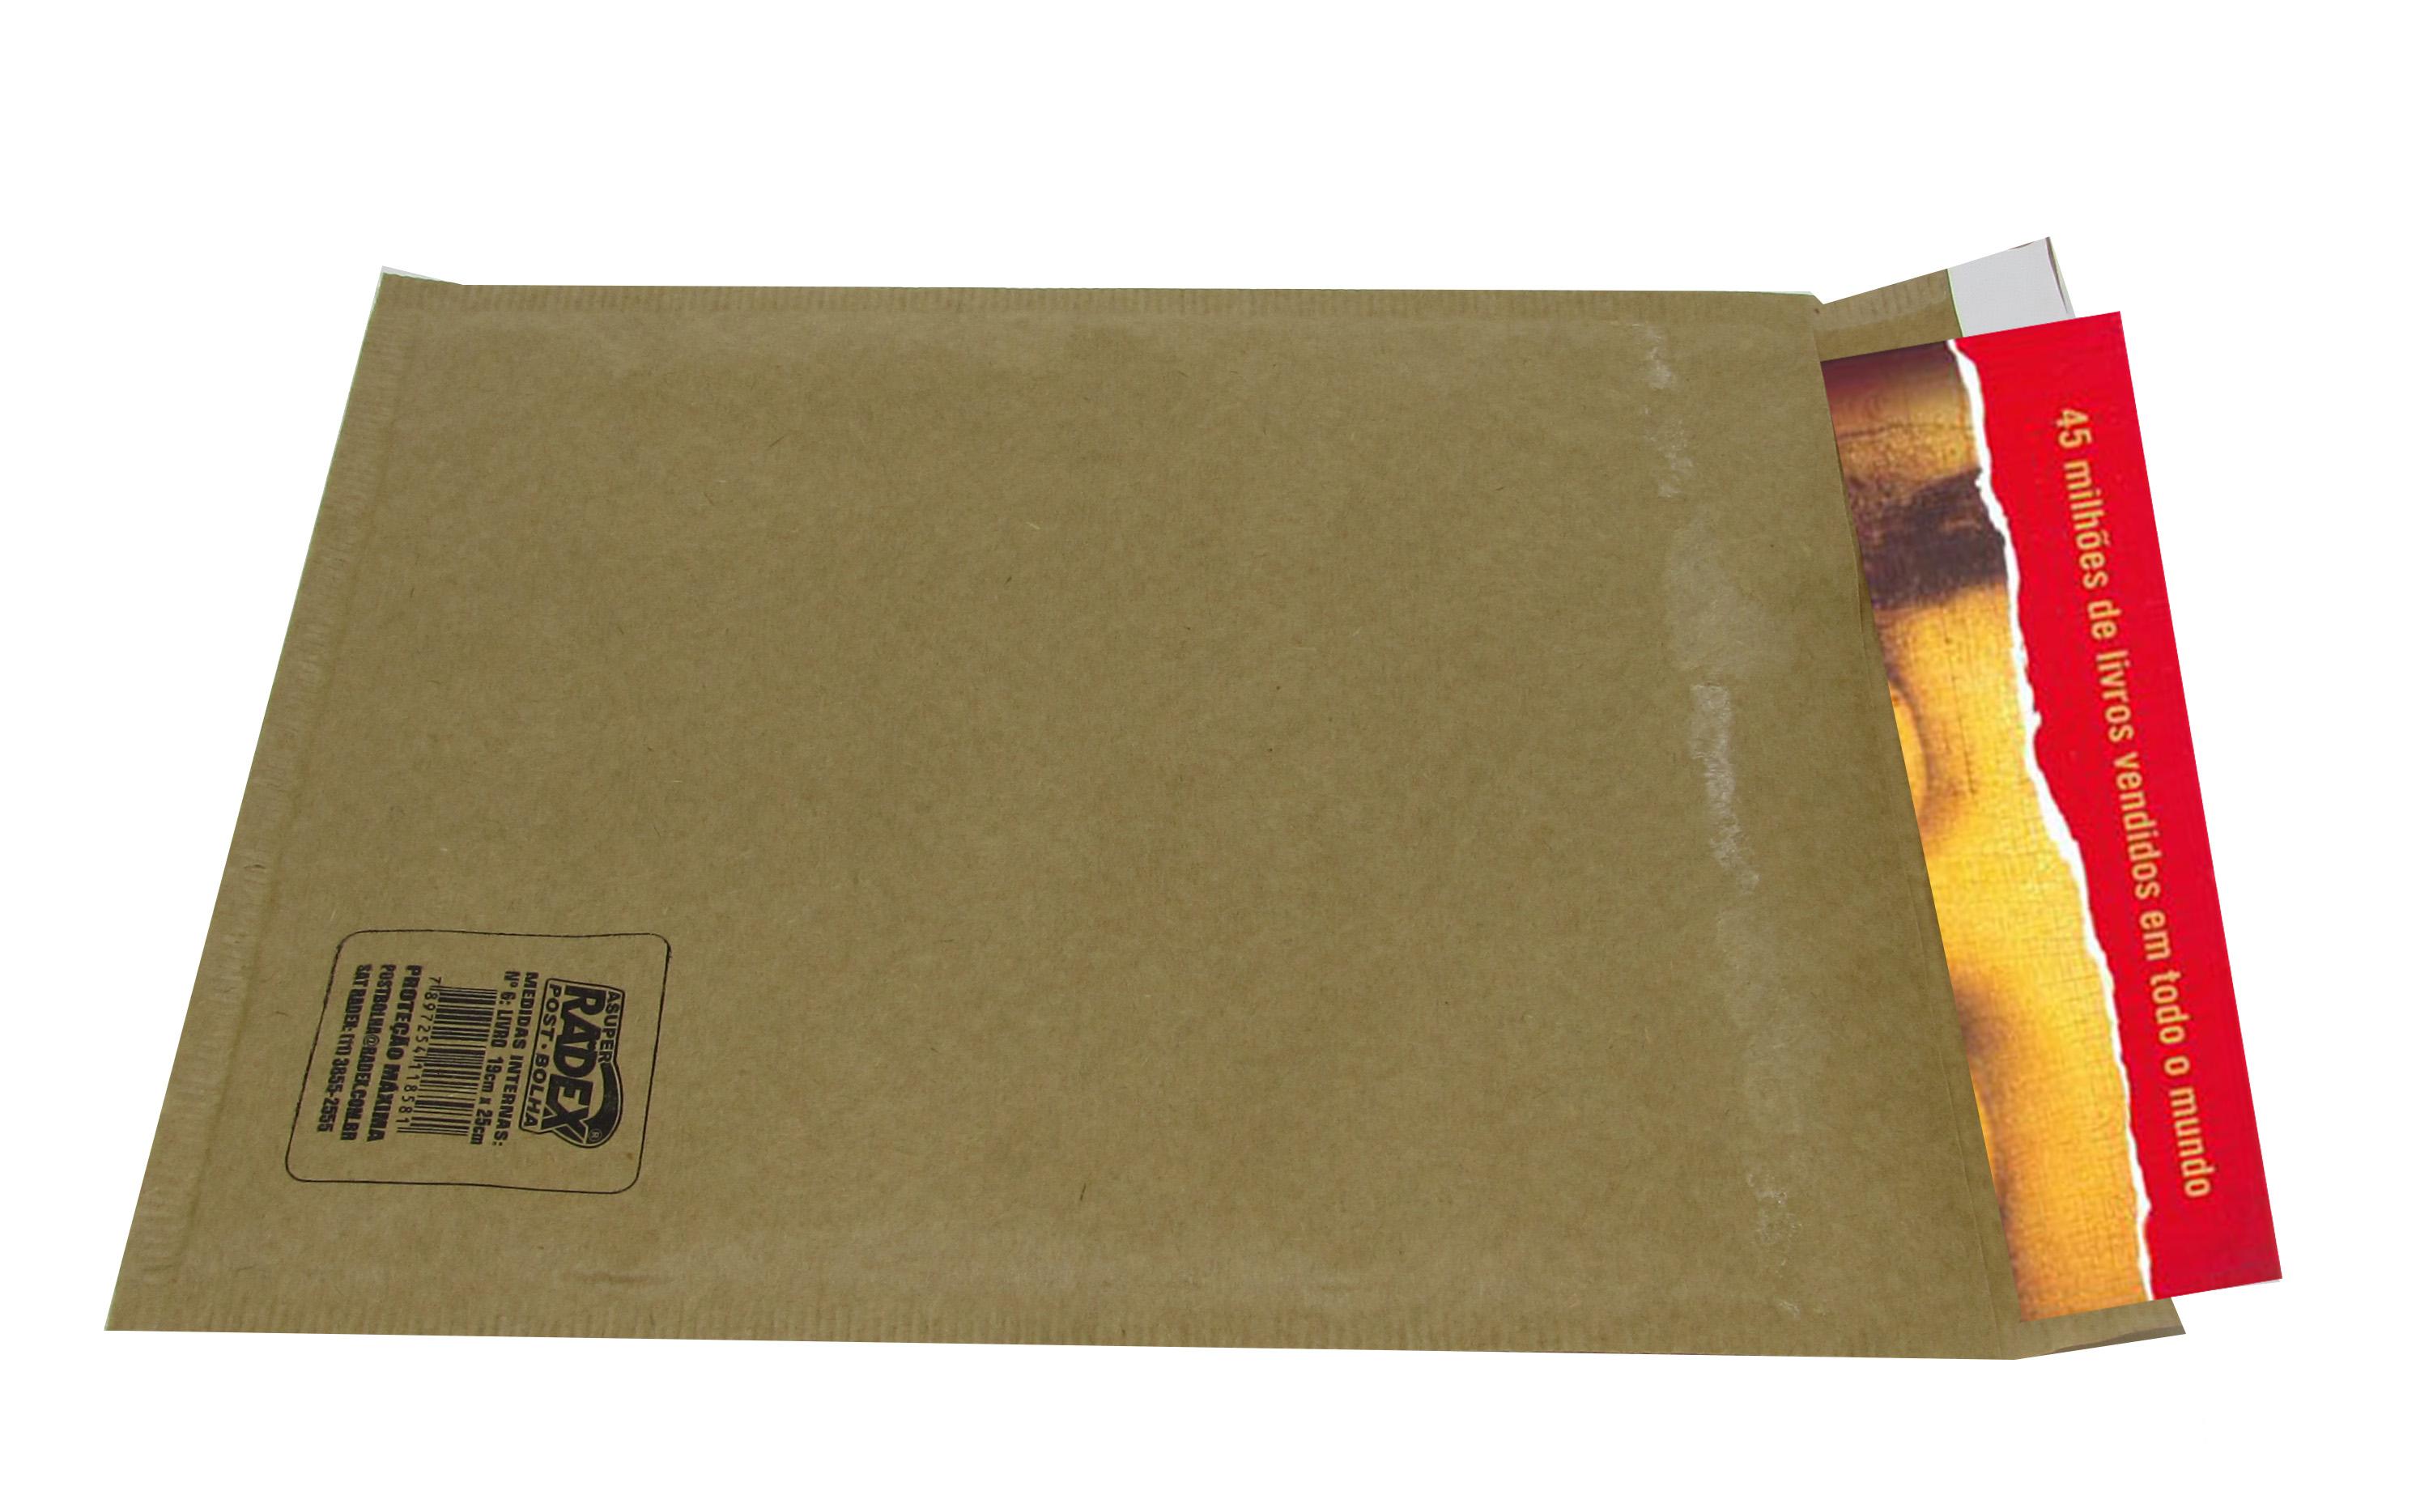 Envelope_6_3